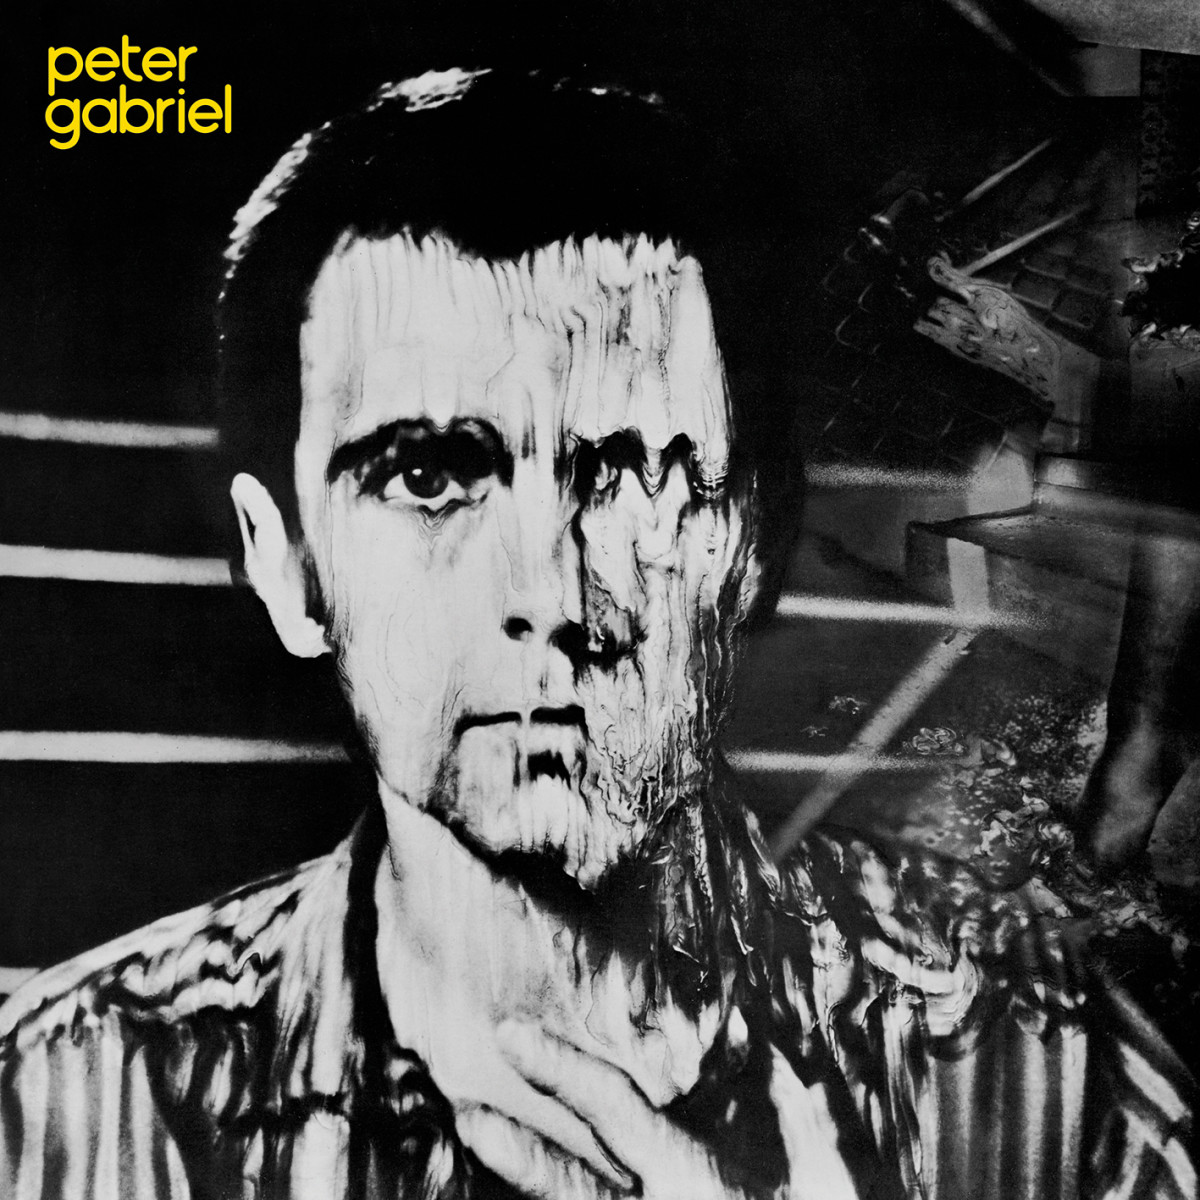 Peter Gabriel streaming